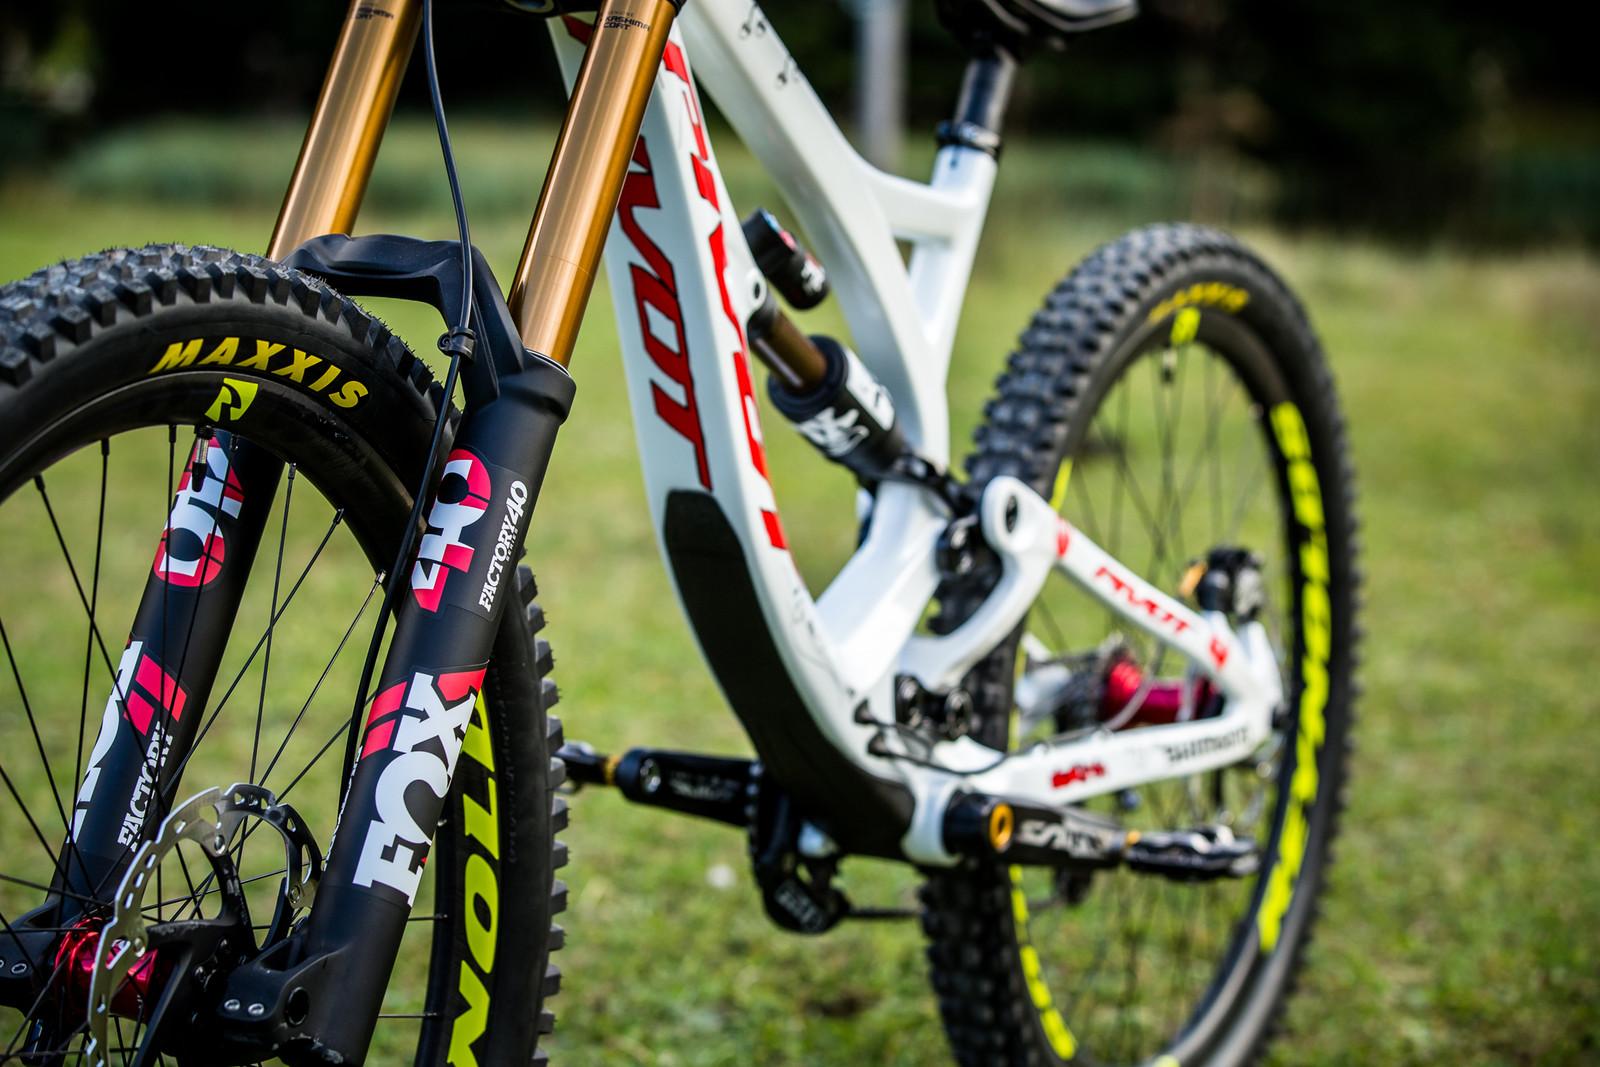 Clean and Crispy - WORLD CHAMPS BIKE - Emilie Siegenthaler's Pivot Phoenix - Mountain Biking Pictures - Vital MTB